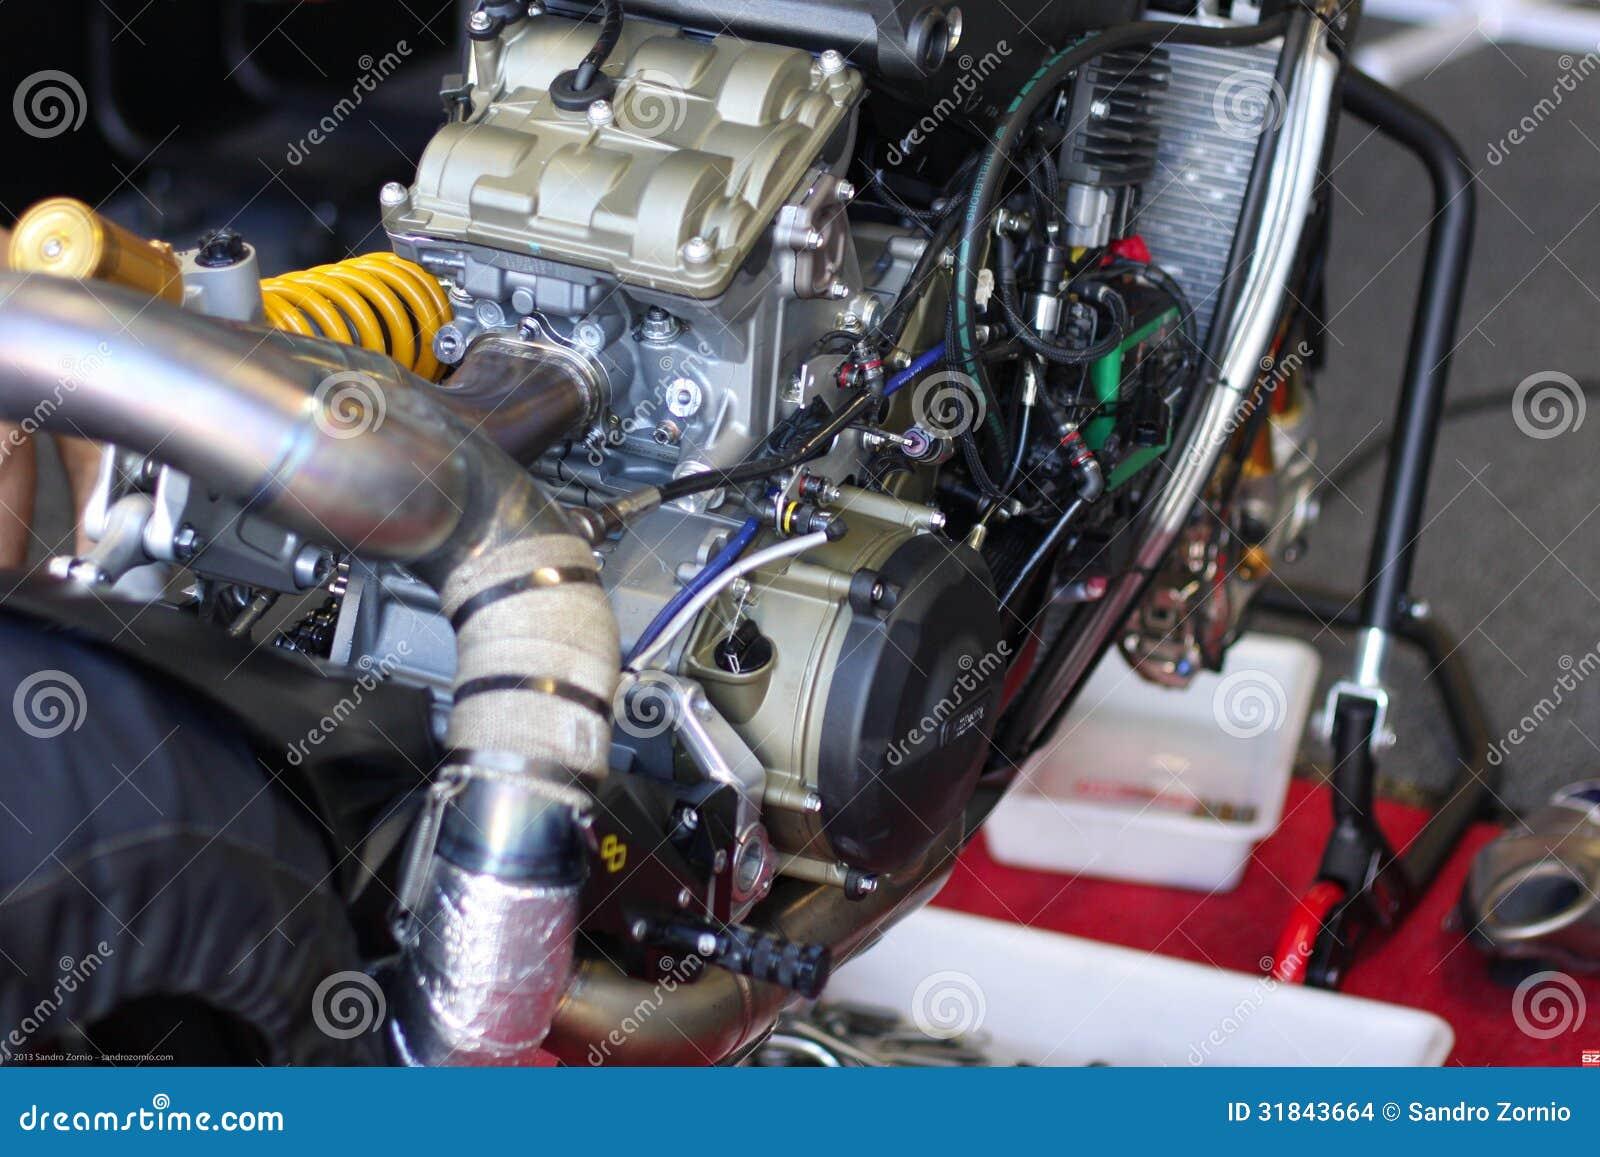 Ducati 1199 Panigale R MR-Racing Superbike WSBK